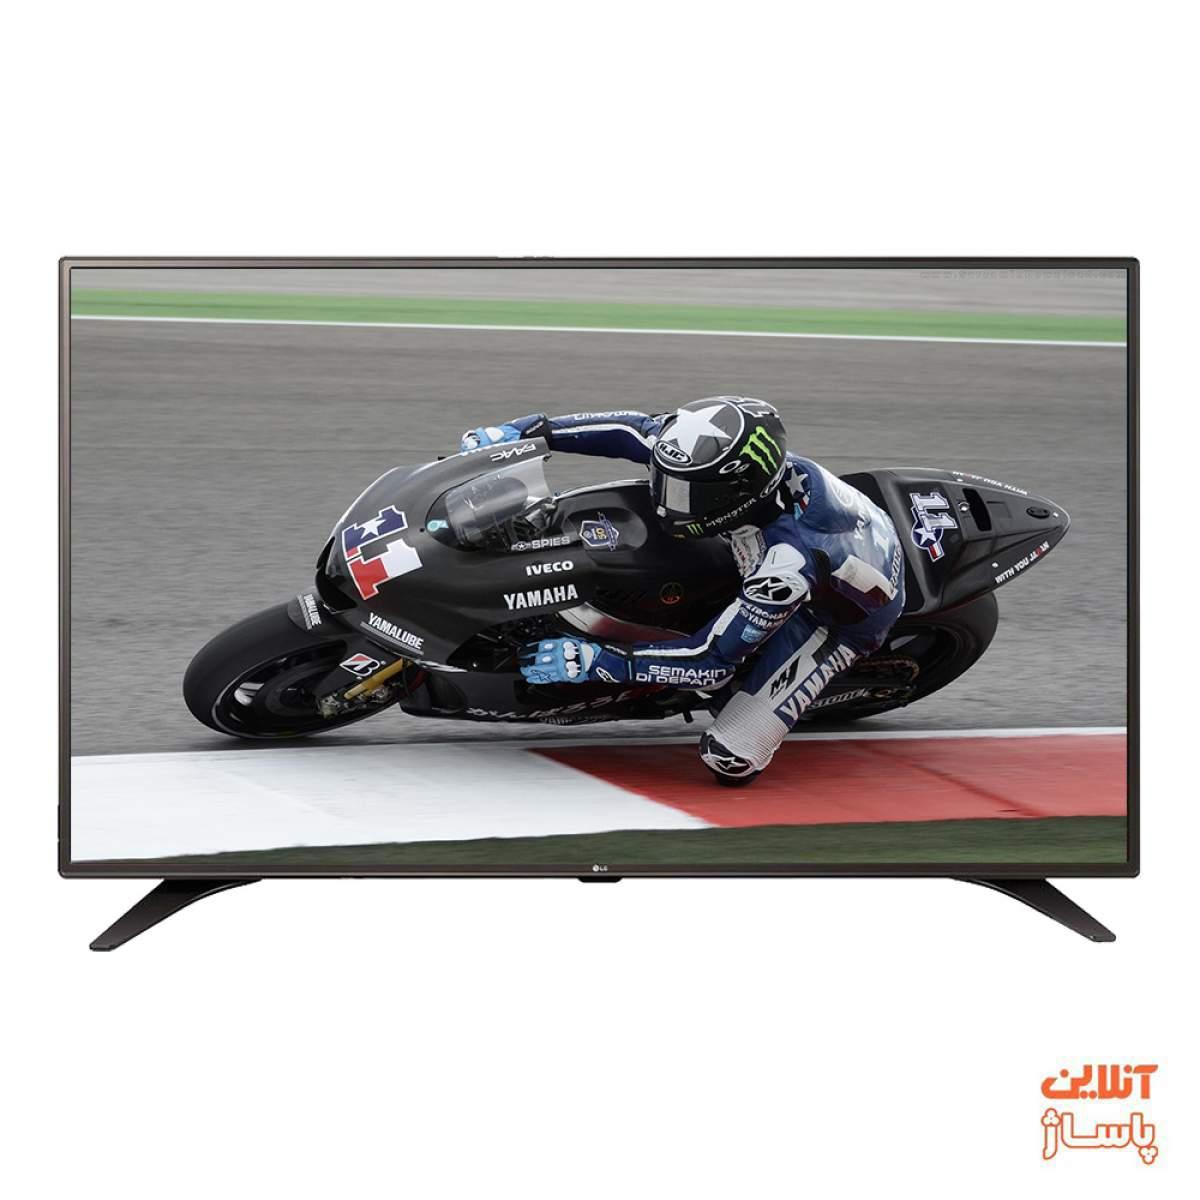 تلویزیون ال ای دی هوشمند ال جی مدل 55LJ62500GI سایز 55 اینچ